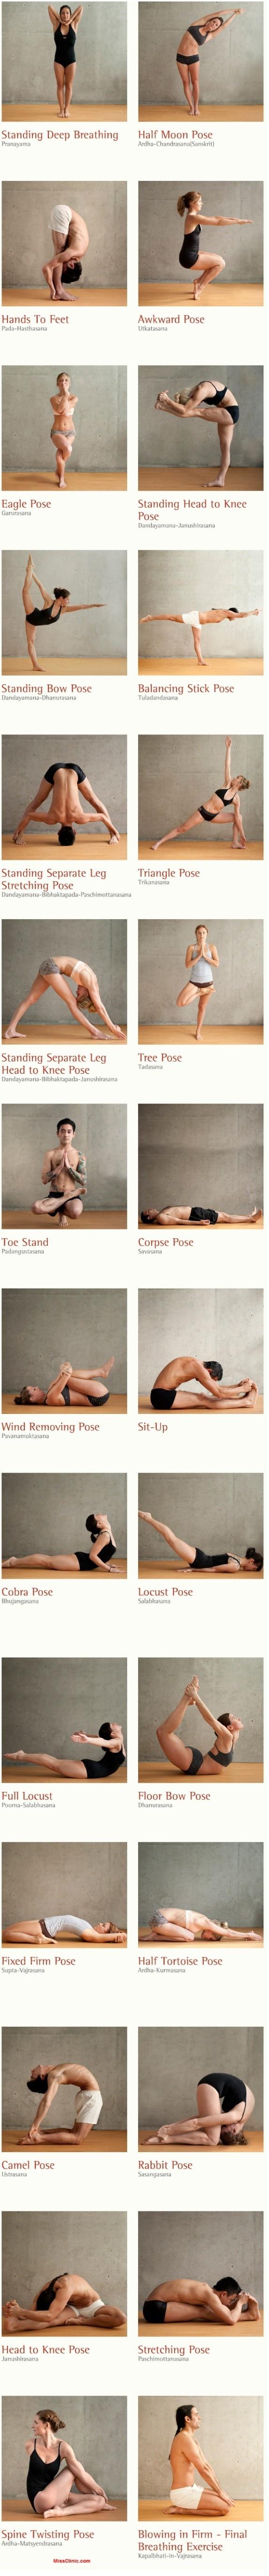 bikram yoga pose sequence